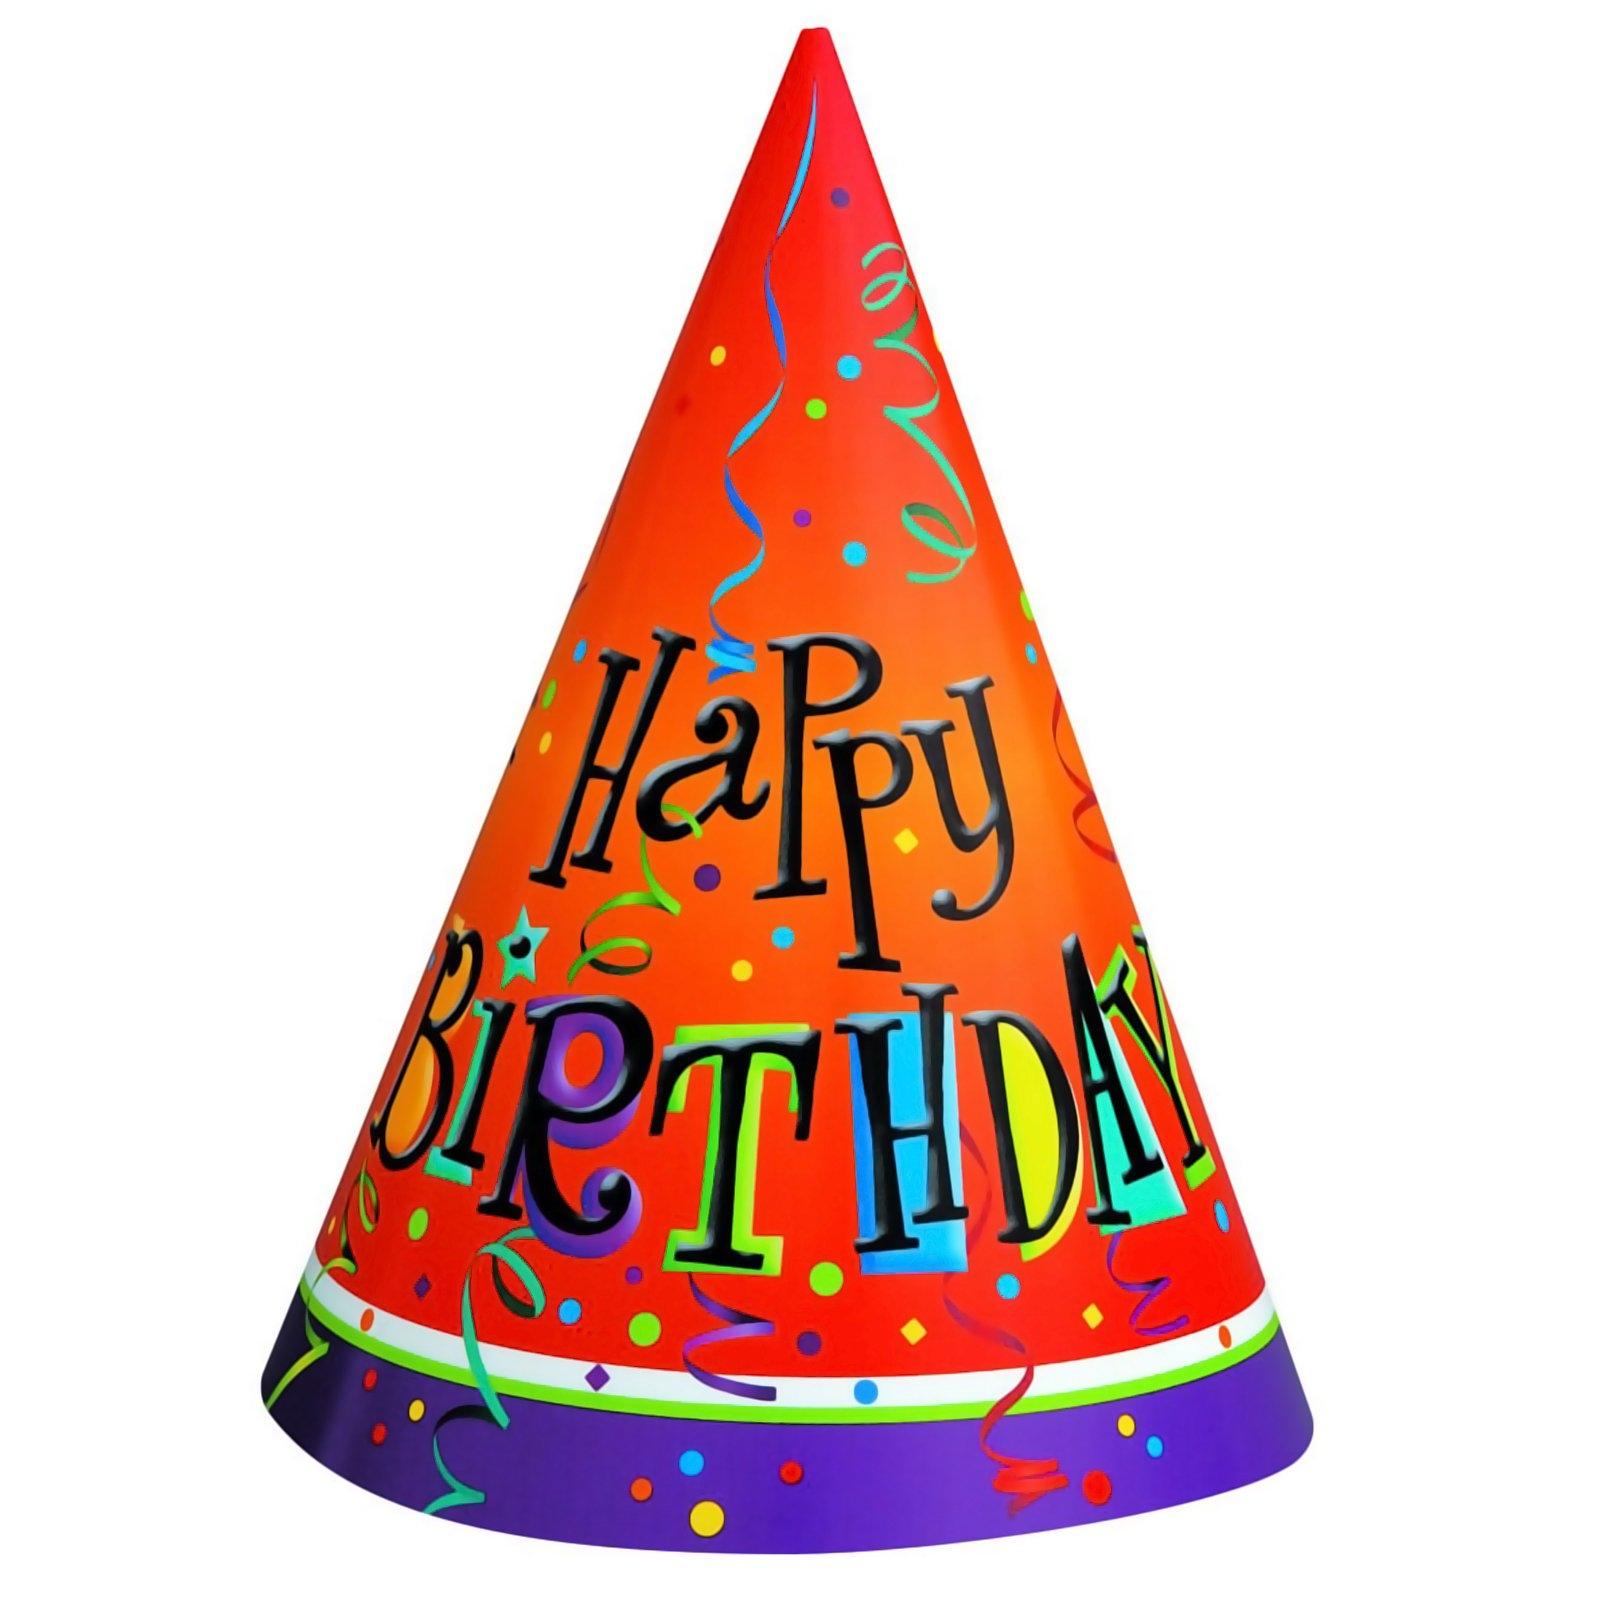 Birthday Hat Clipart No Backg - Birthday Hat Clipart